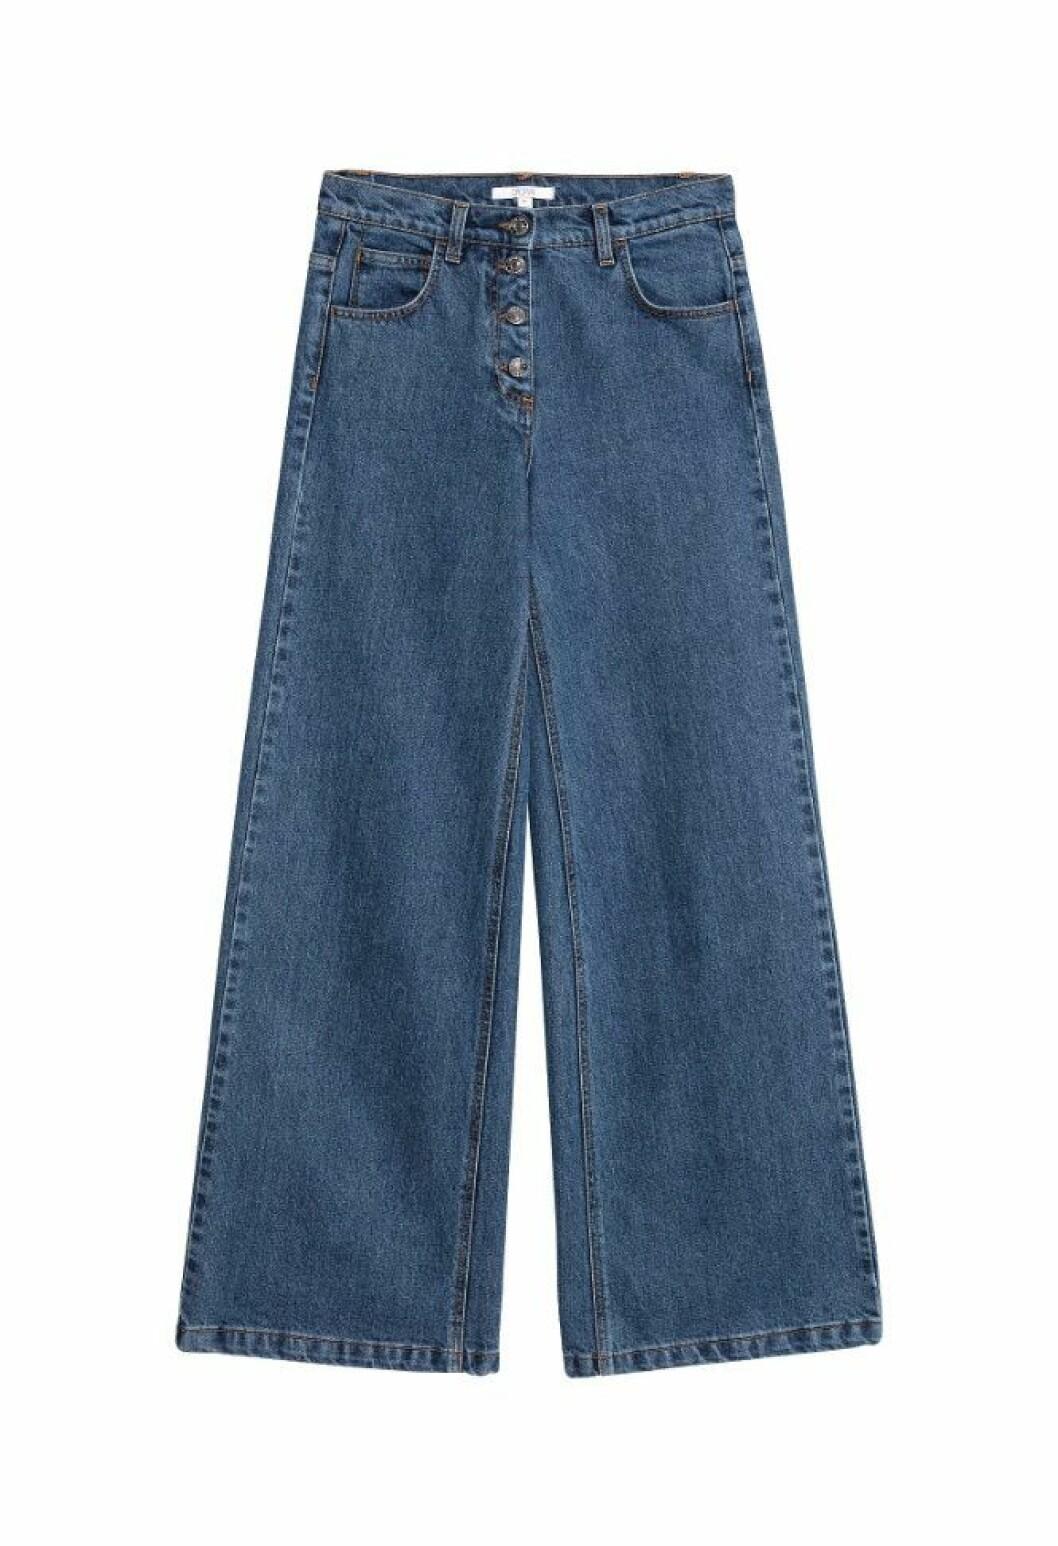 Jeans från Dagmar